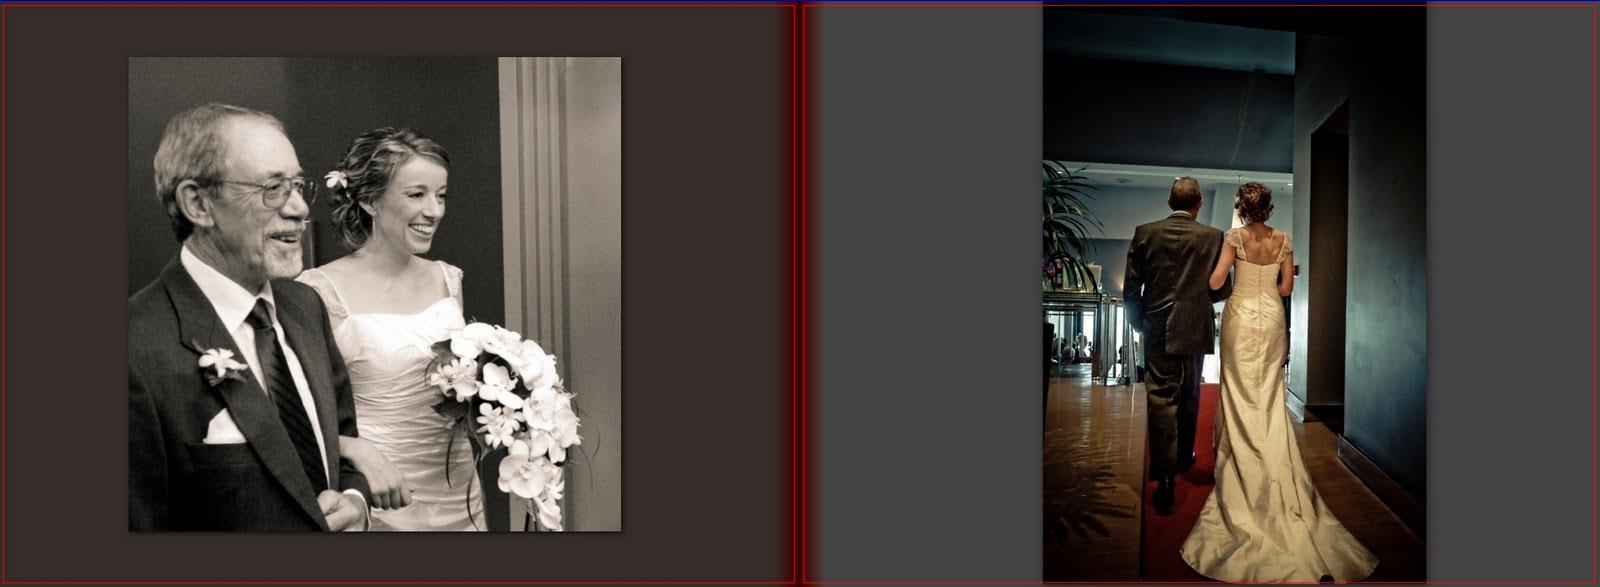 wedding photos album design